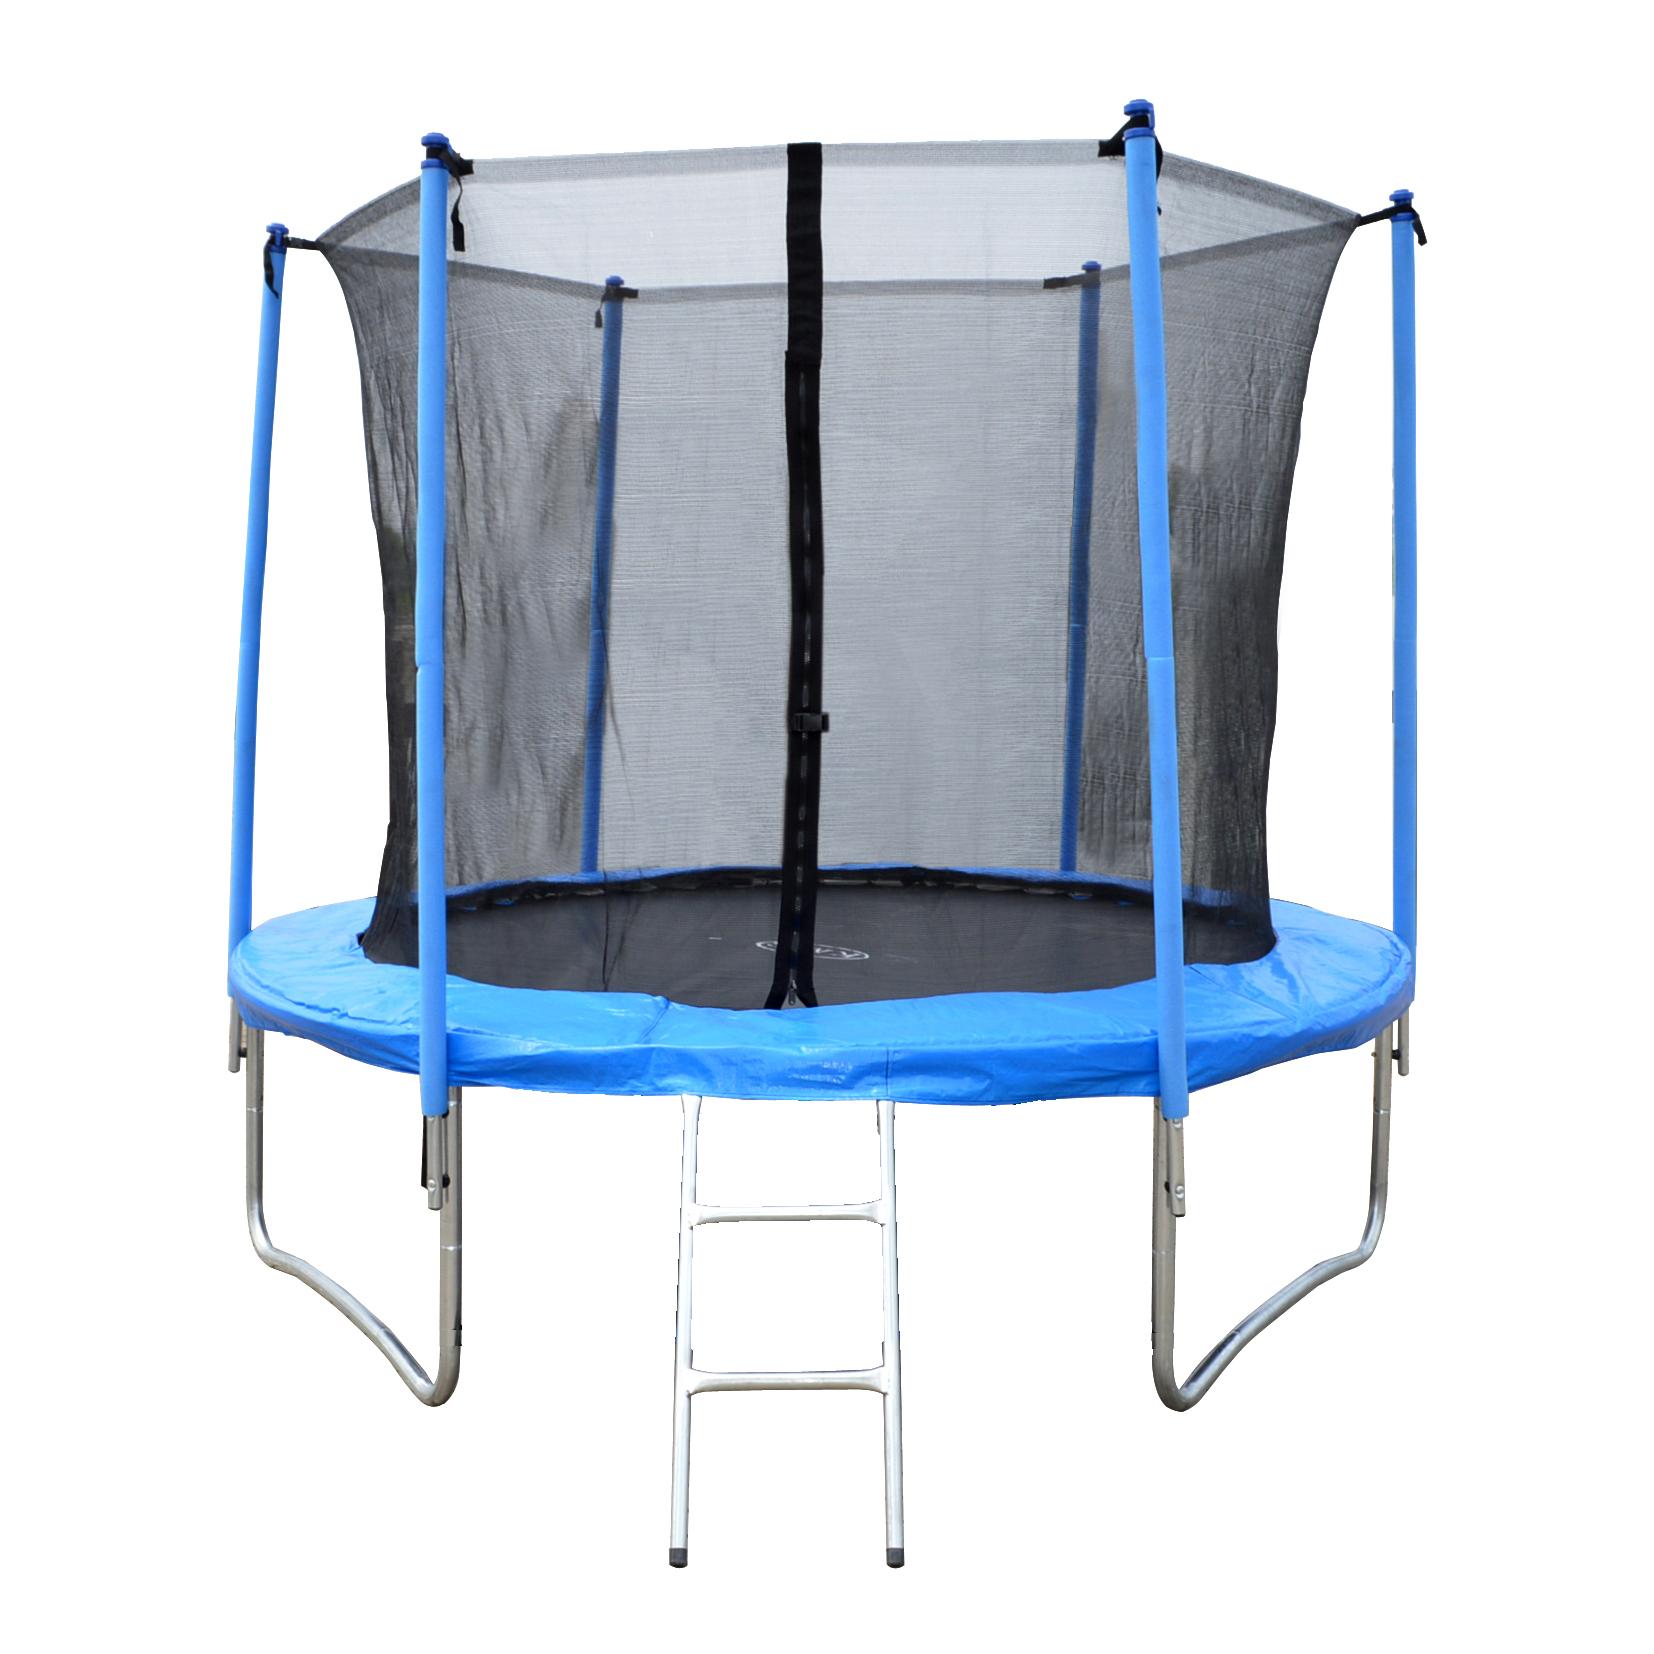 8FT 10FT 12FT 14FT 16FT Trampoline With Ladder Rain Cover